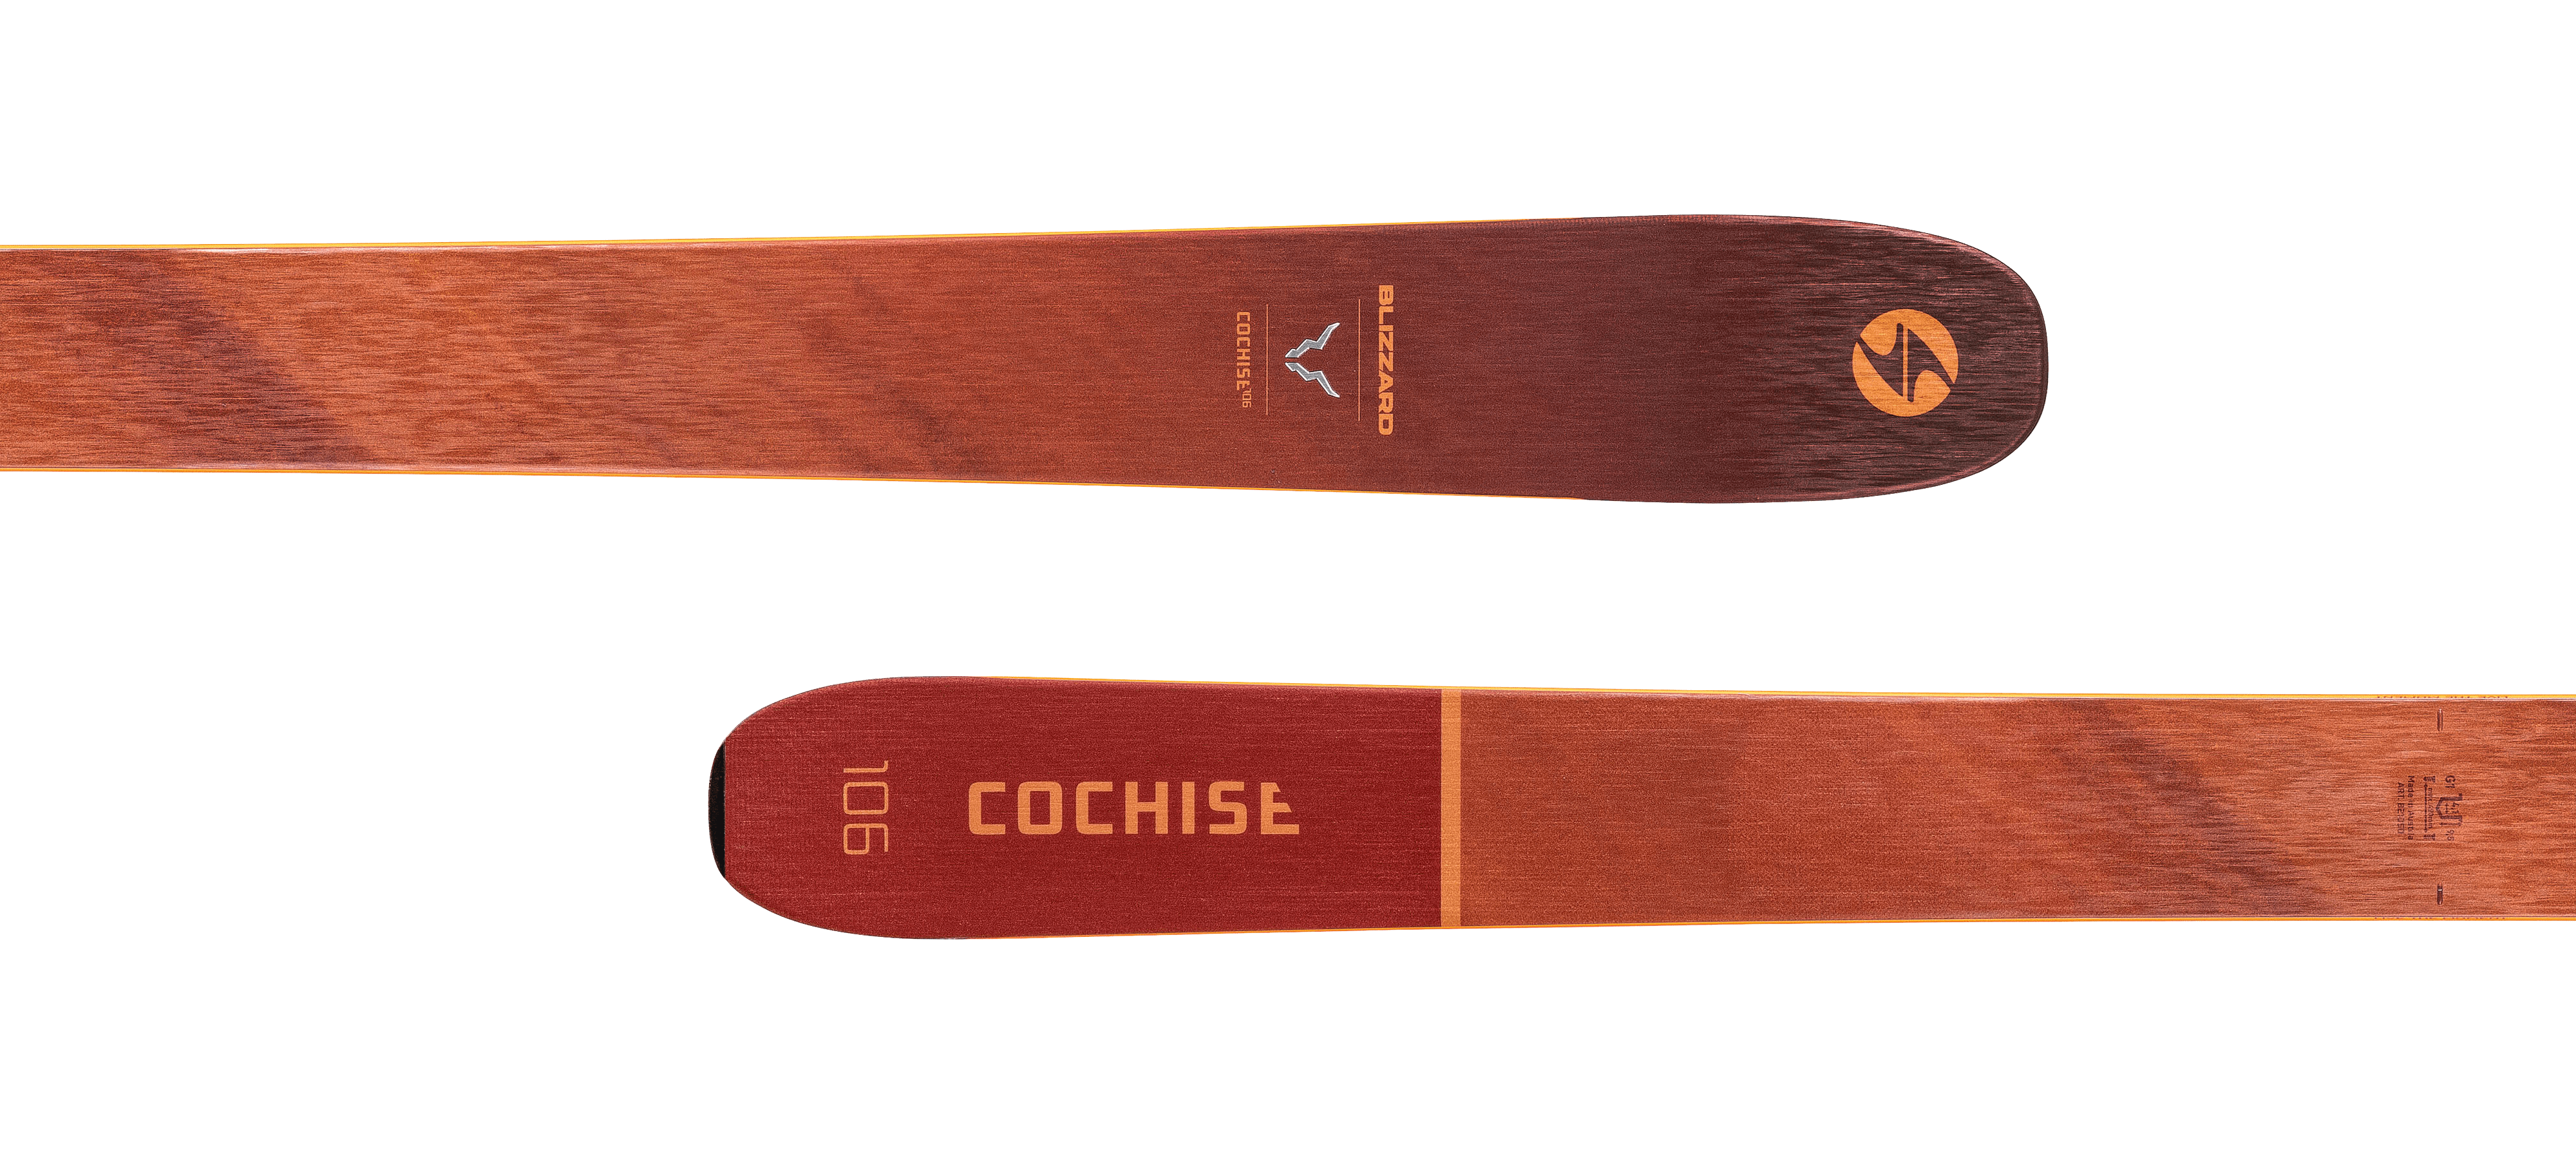 COCHISE 106